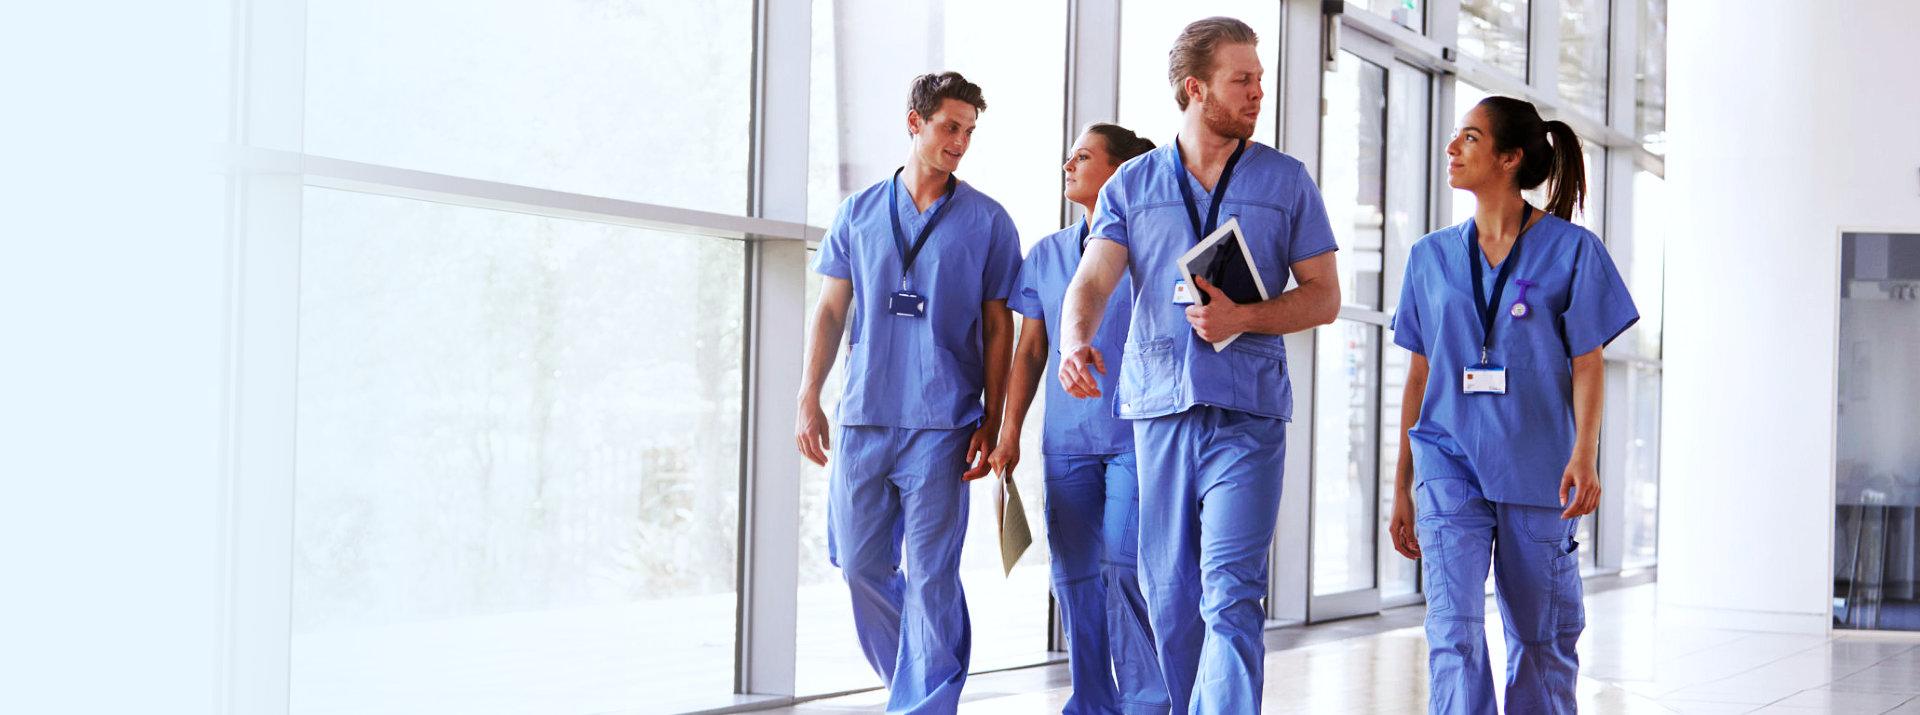 medical staffs walking